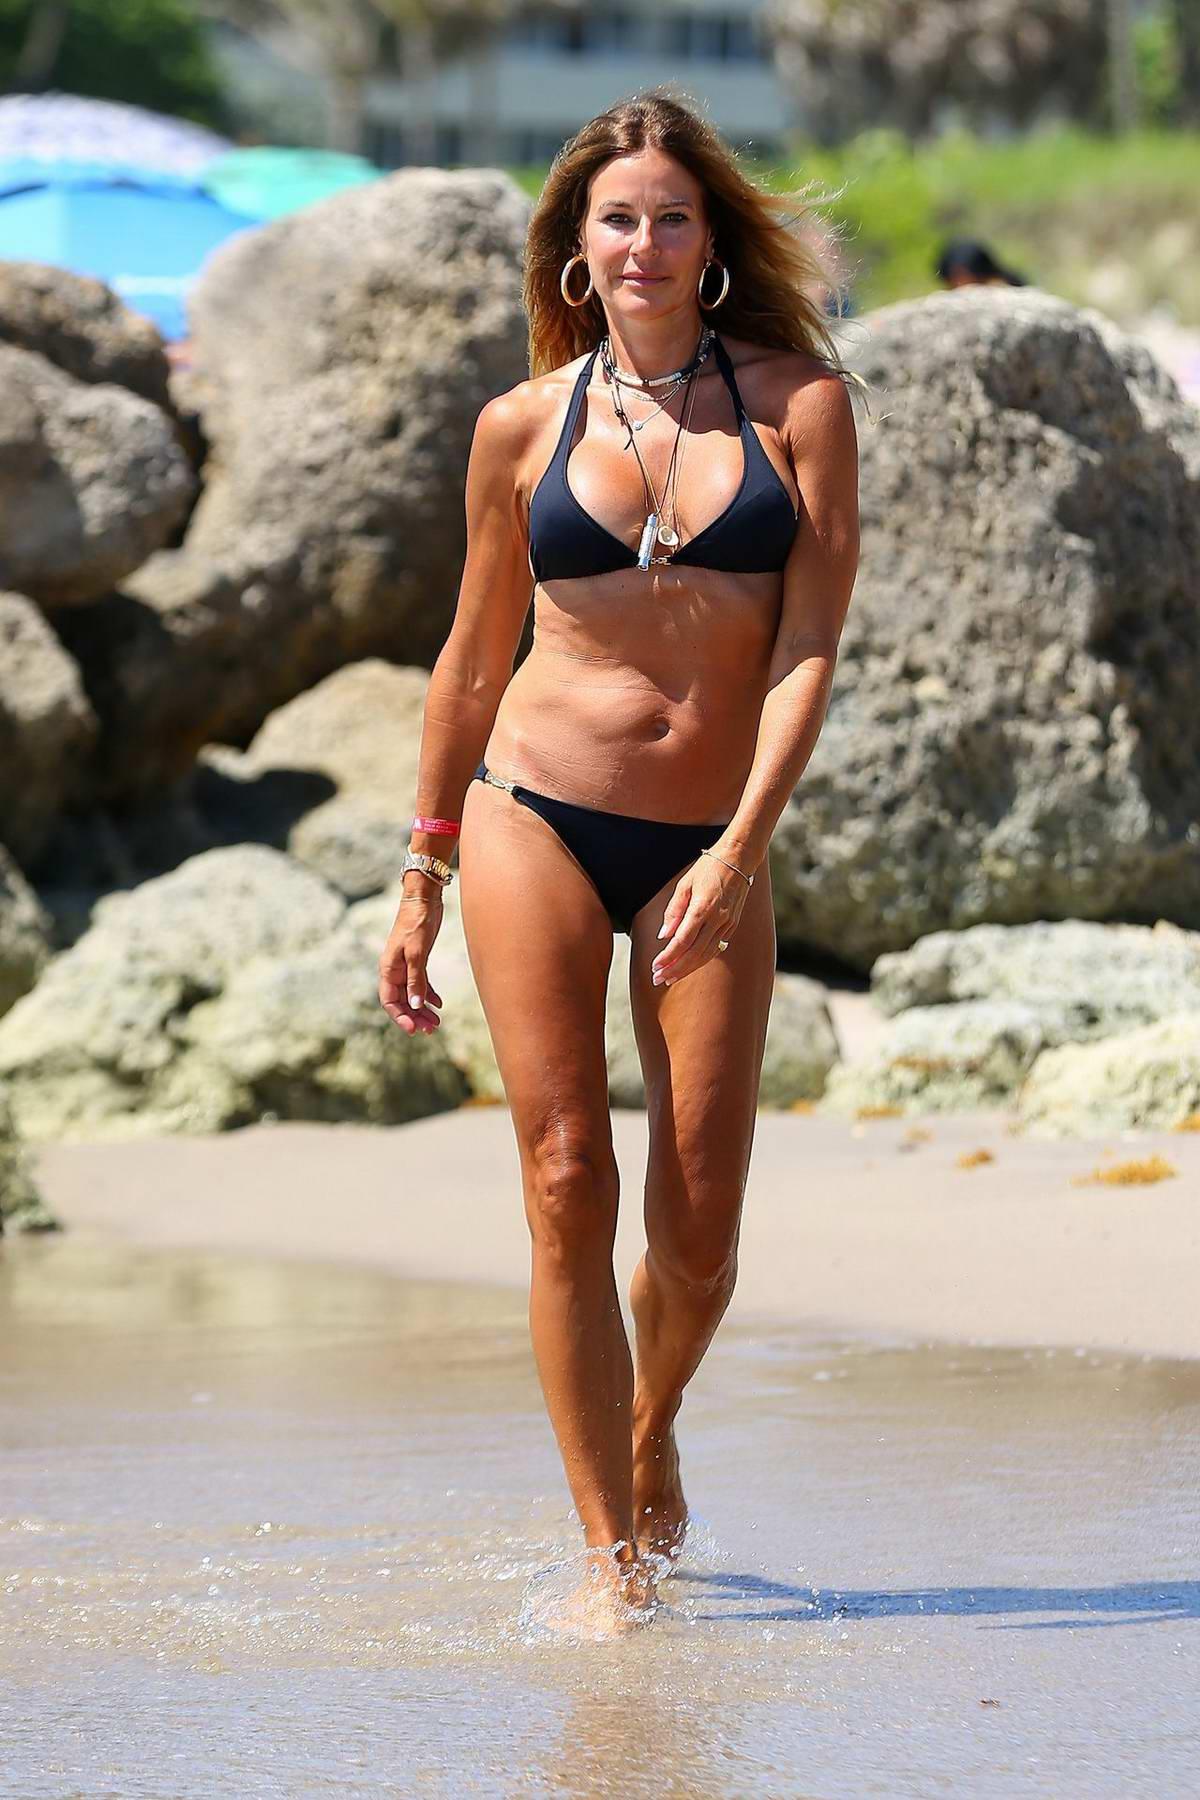 Kelly Bensimon sports a black bikini for a beach day in Deerfield Beach, Florida